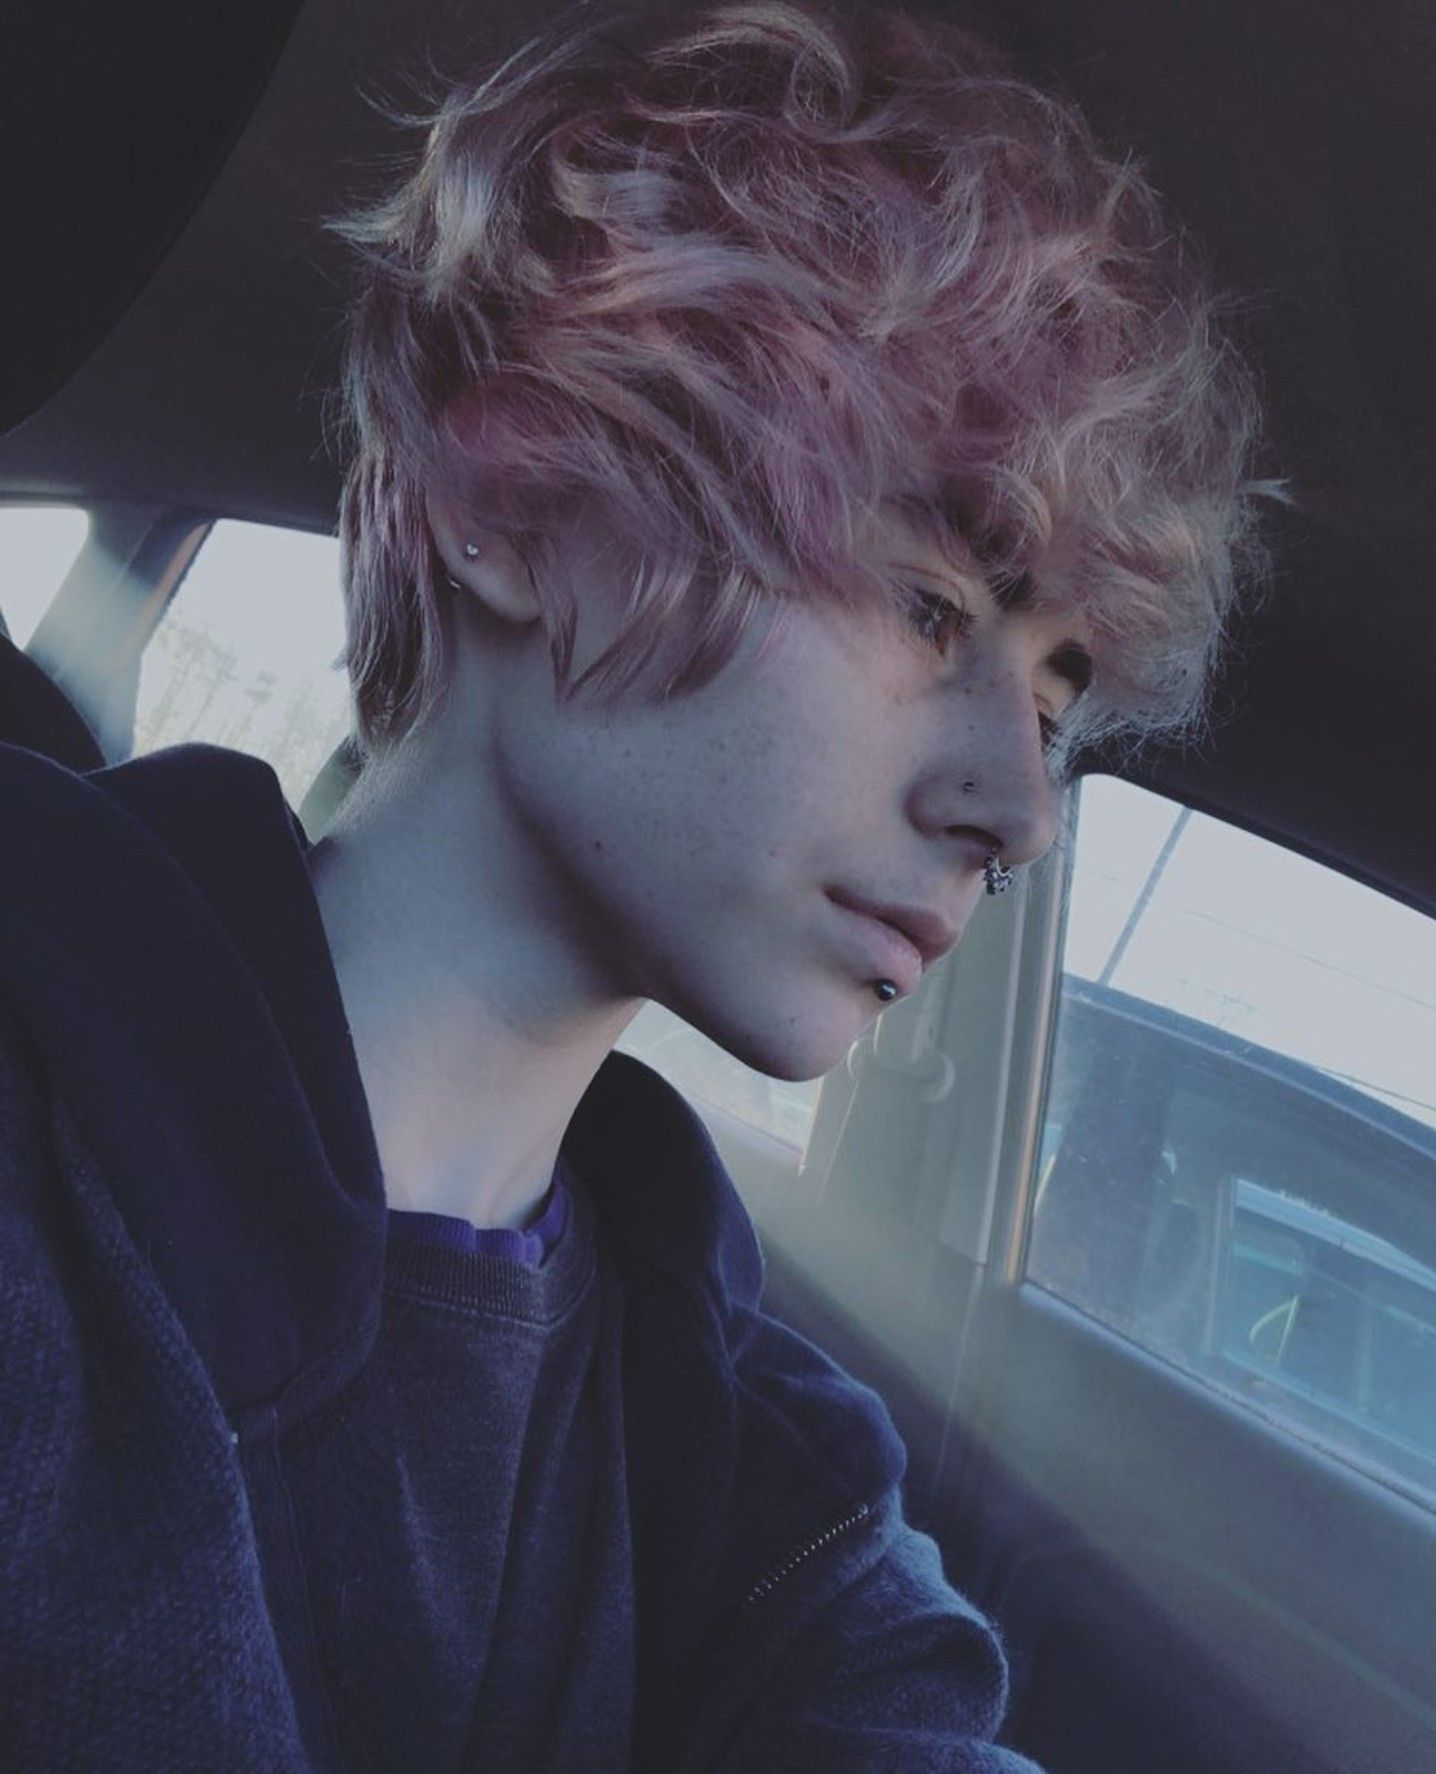 Pin By Weefroggy On Hair Emo Boy Hair Dye My Hair Fluffy Hair